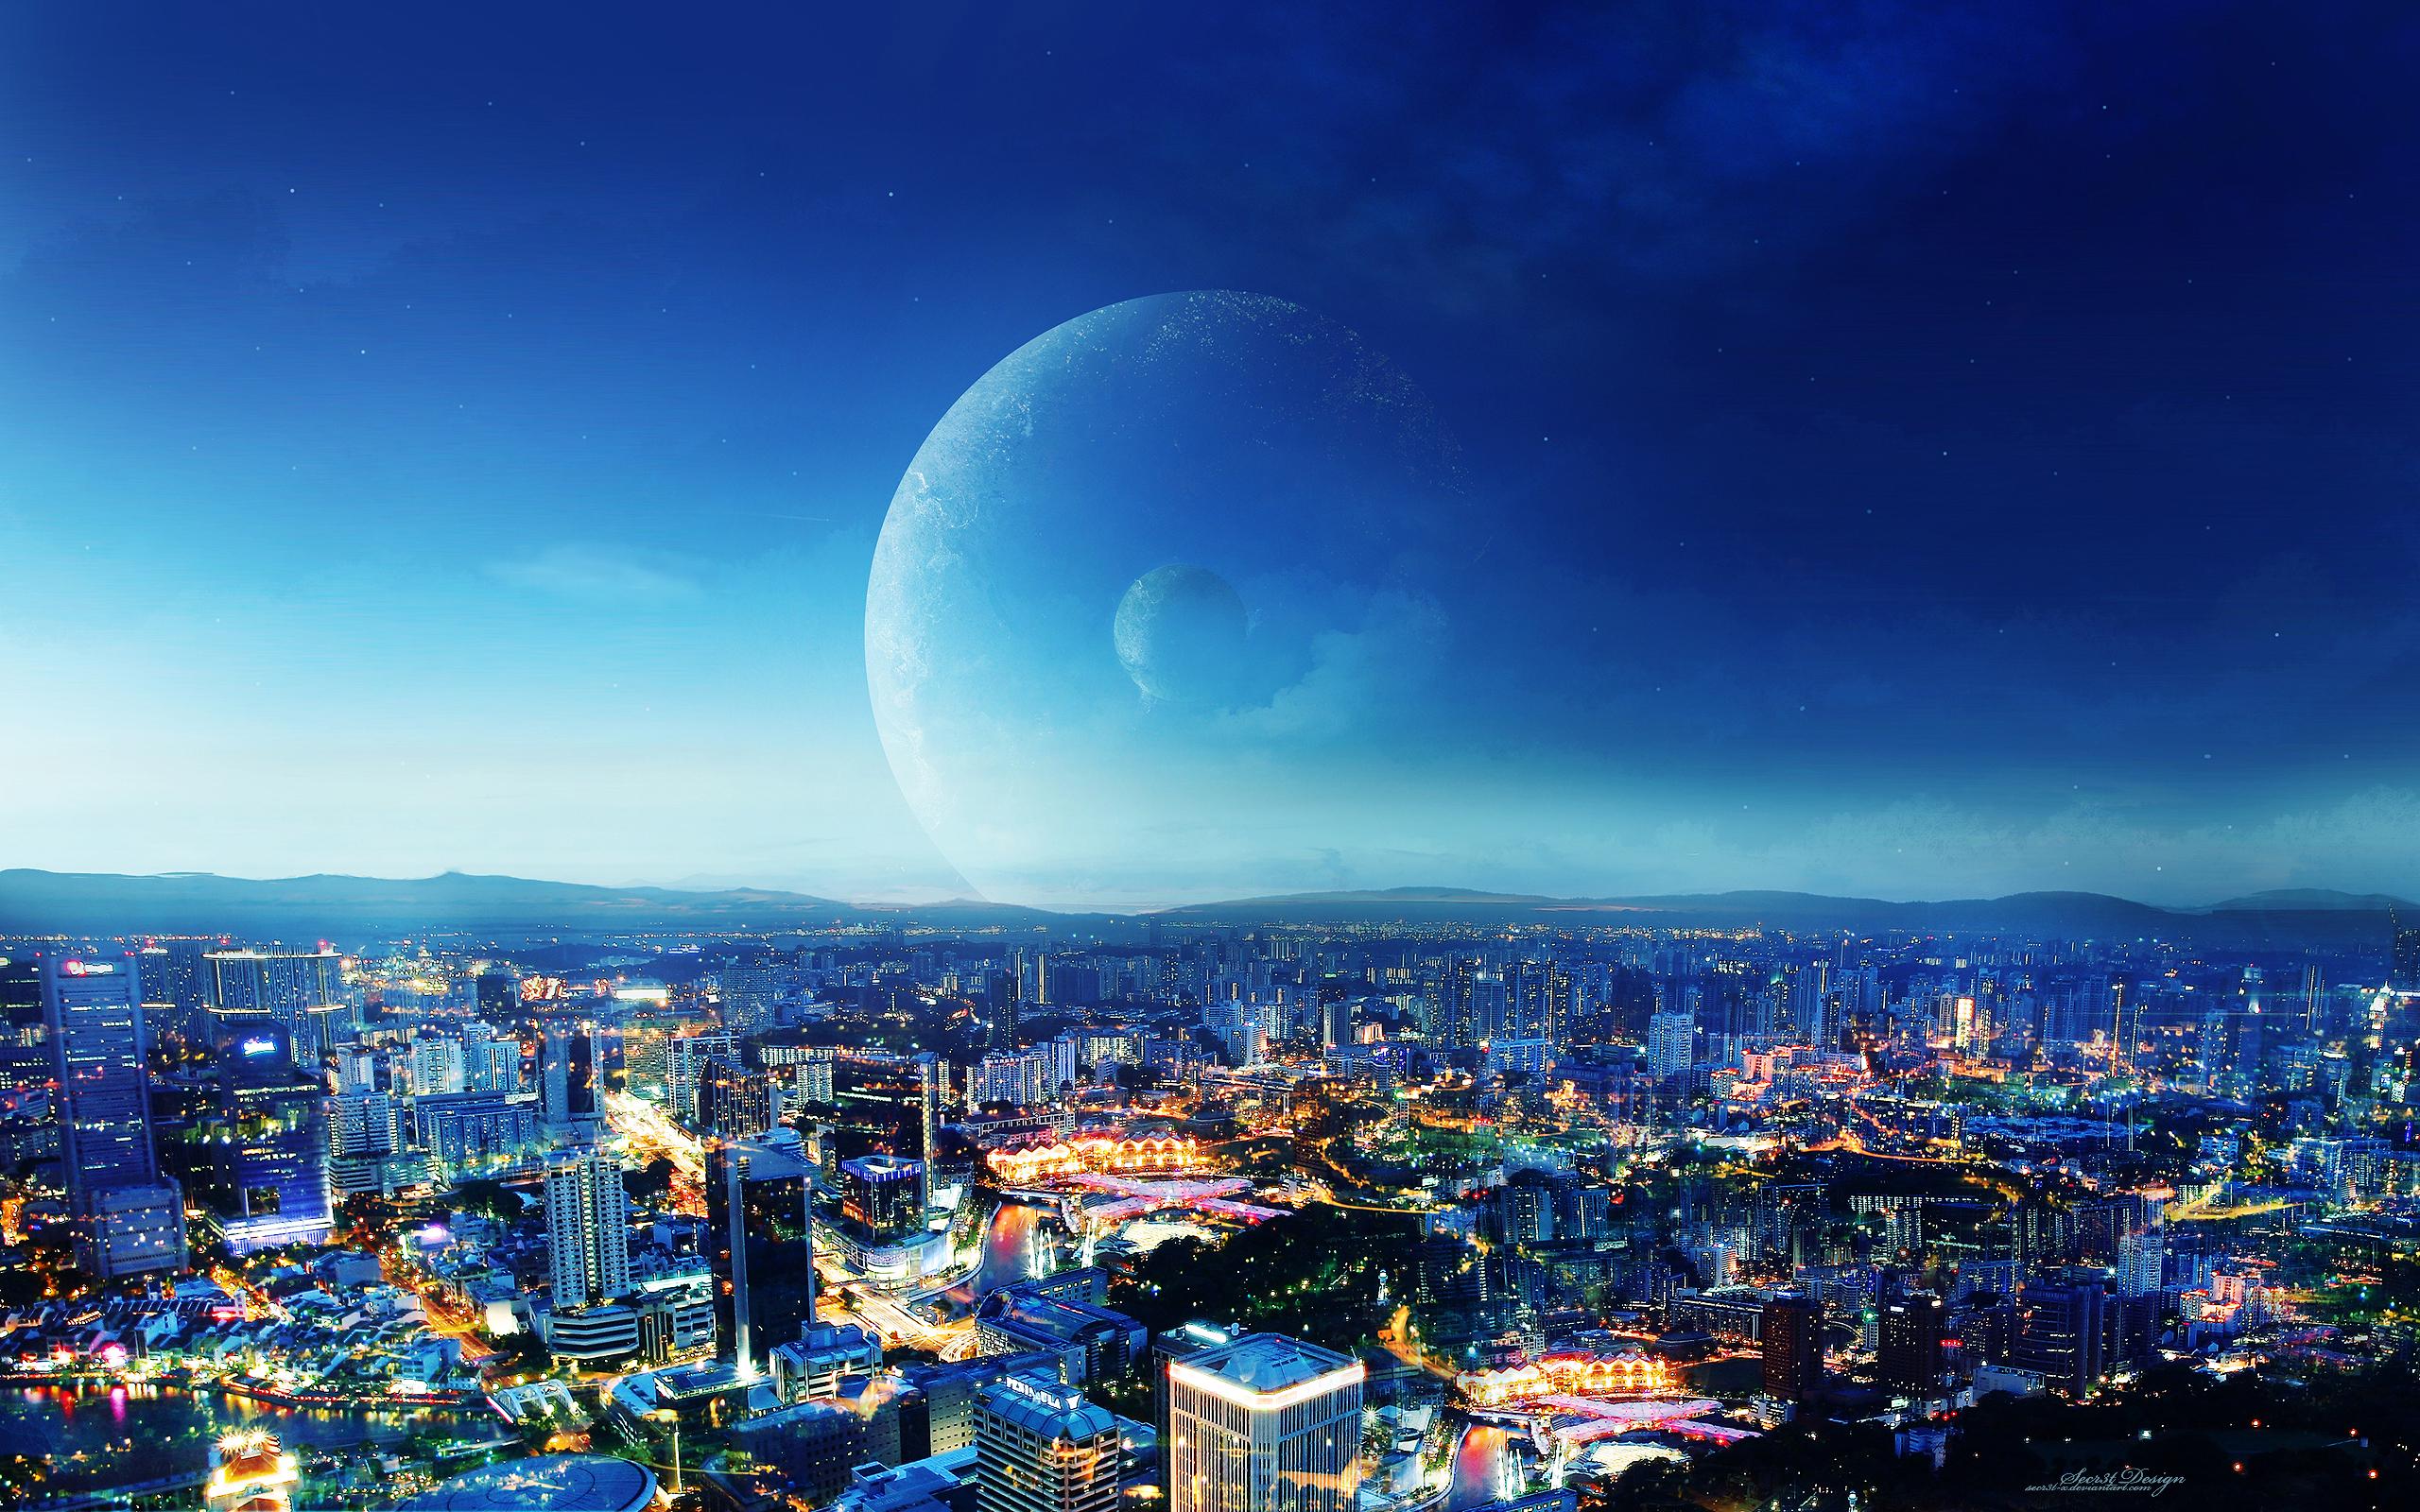 Night City Wallpaper 2560x1600